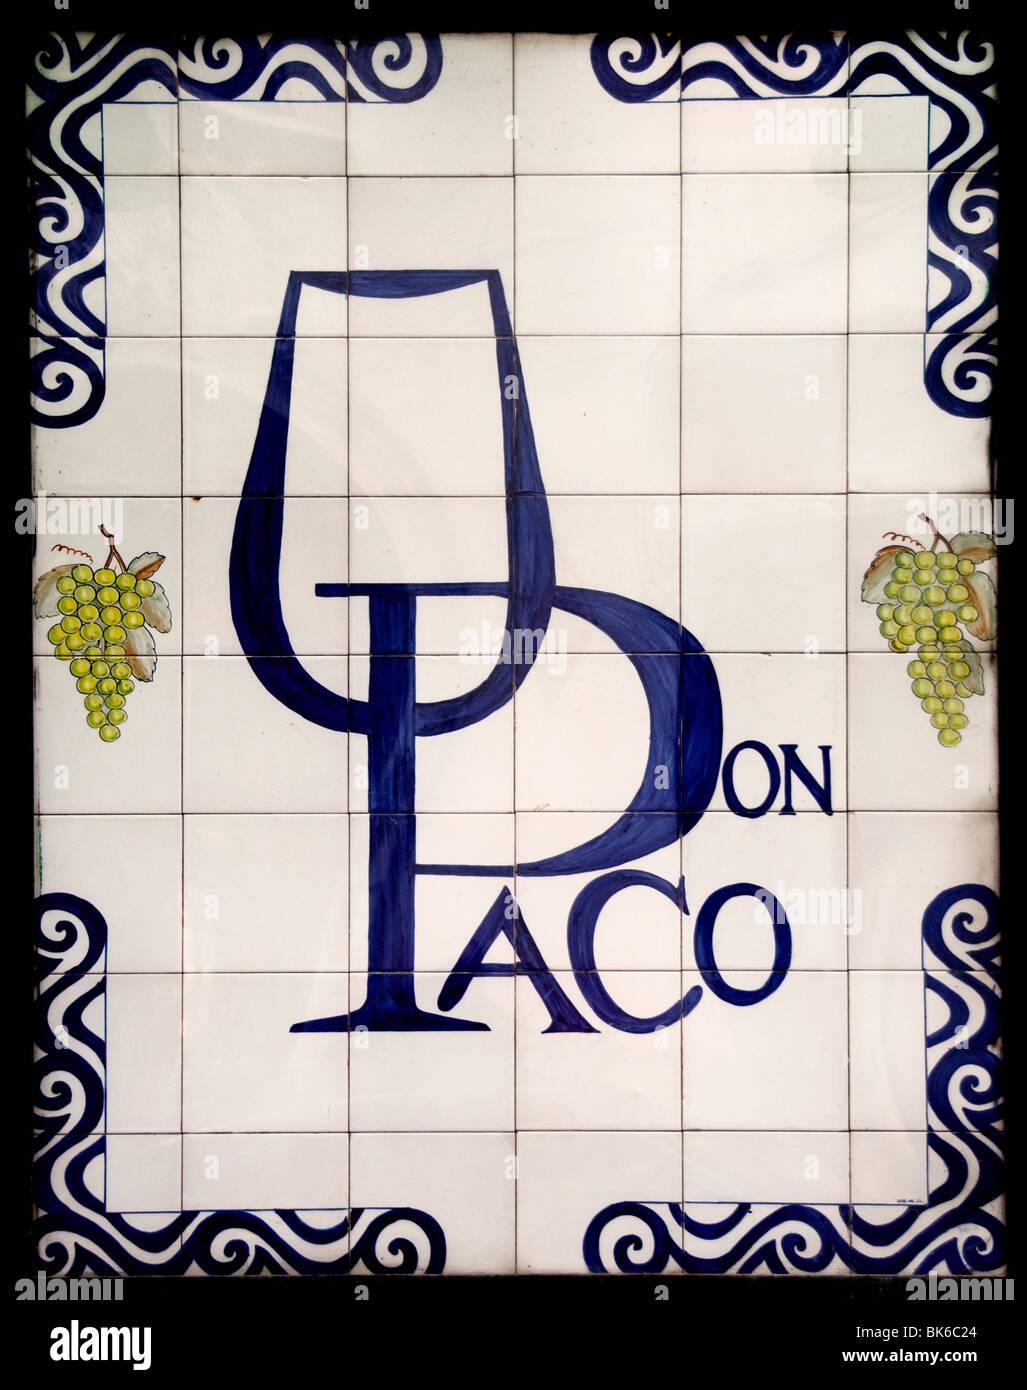 Spain Spanish Madrid wall tiles Don Paco Wine - Stock Image